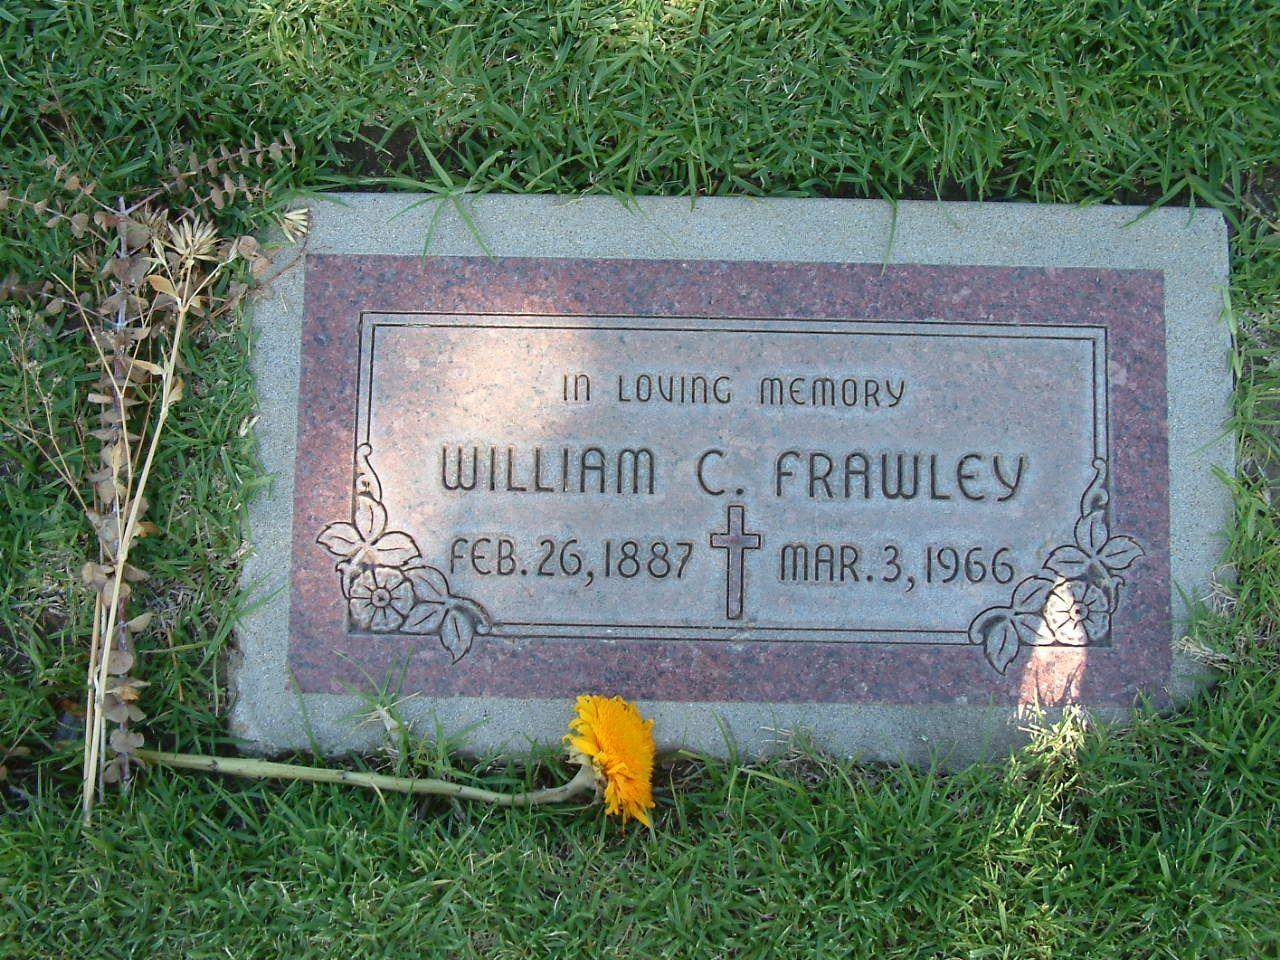 fc5c5423c8a1cd7b1cf4dea0d2f8025a - Fred Hunter's Hollywood Memorial Gardens